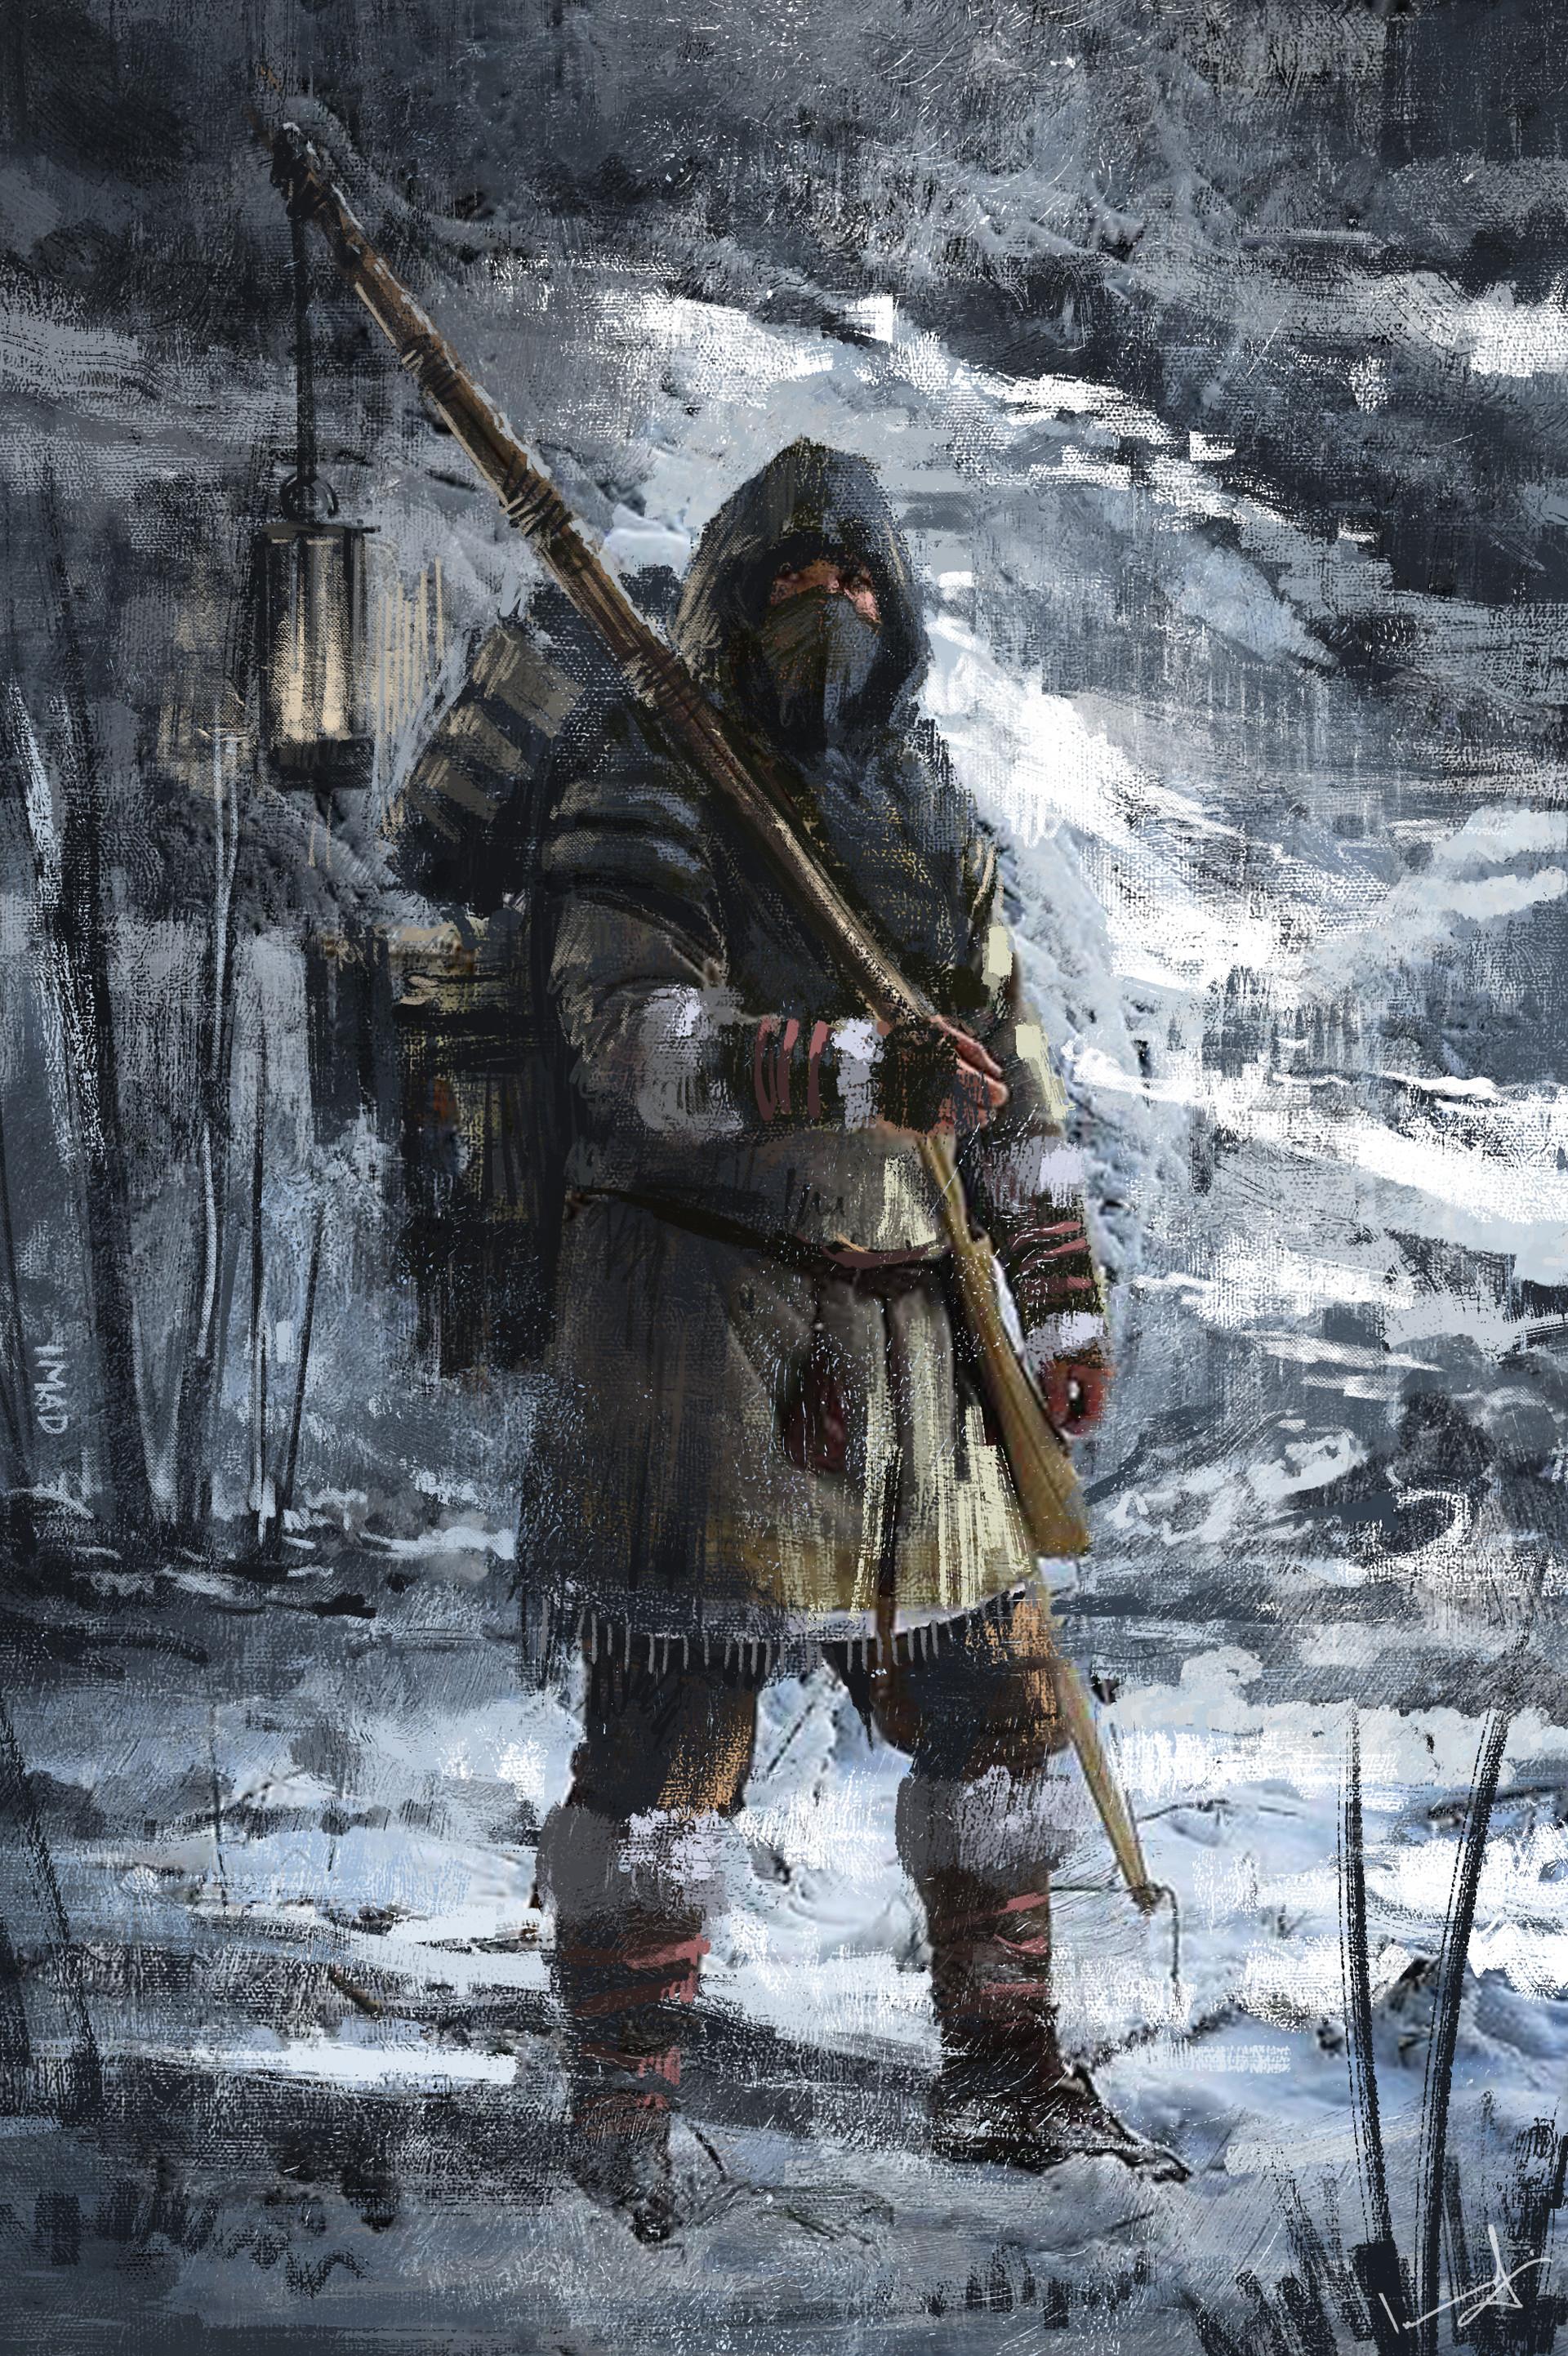 Imx awan winter warrior